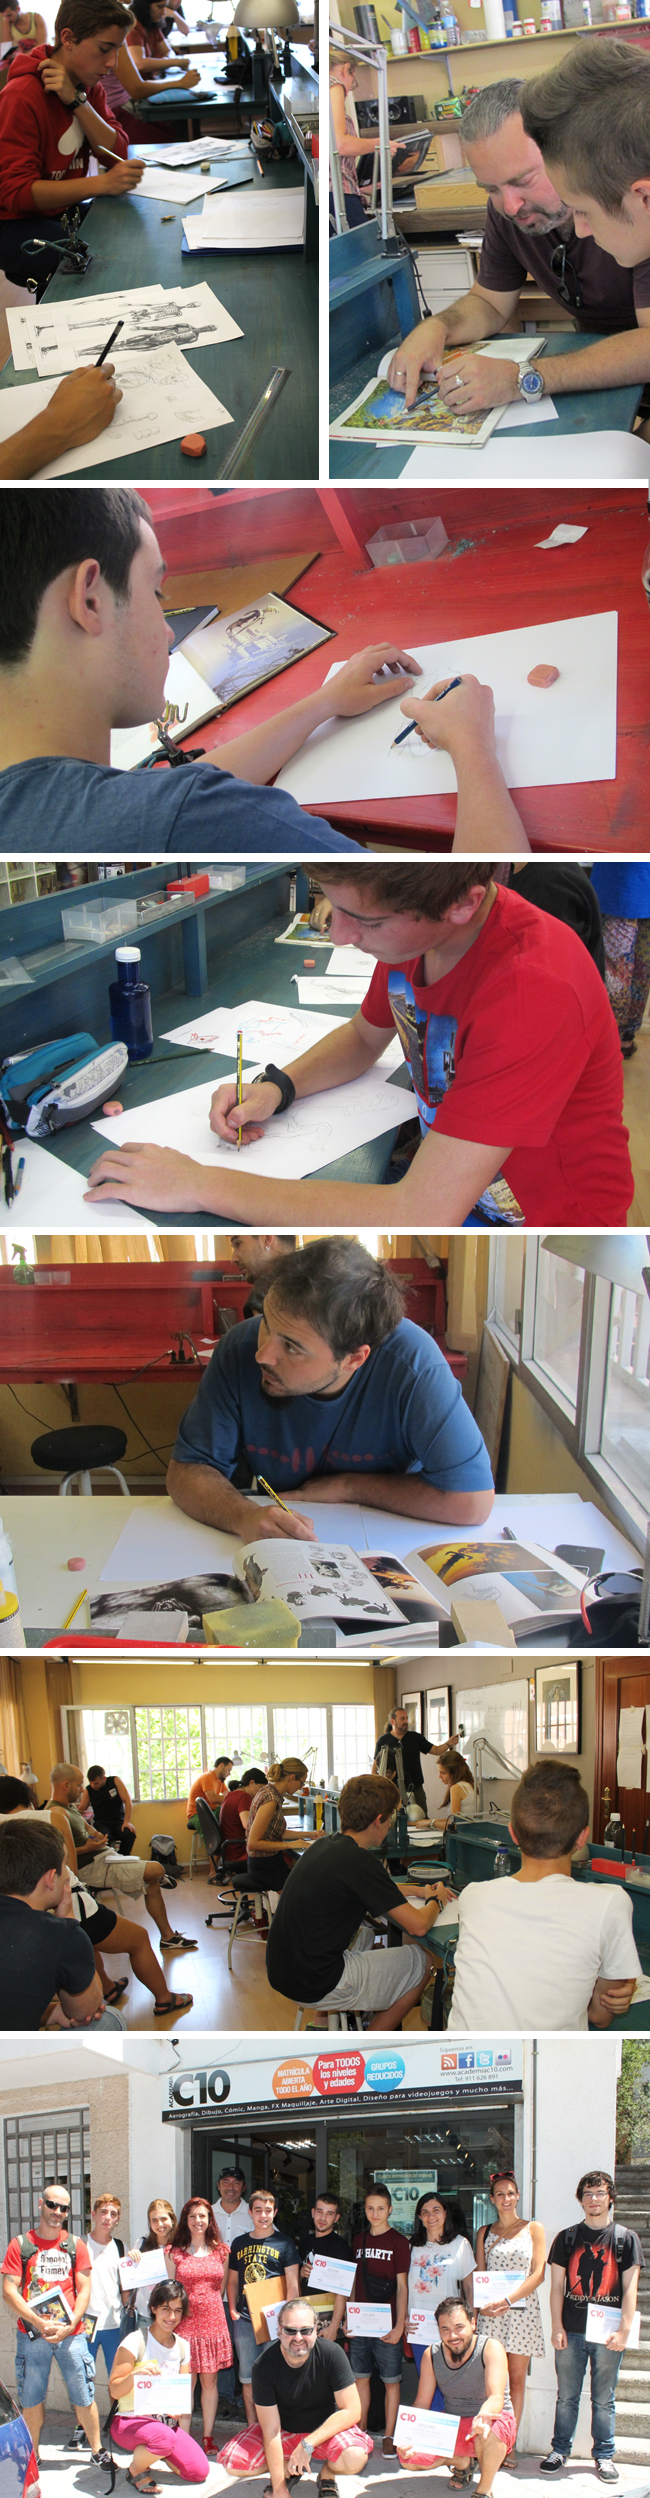 alumnos-curso-intensivo-verano-comic-trabajando-mariano-saura-anual-dibujar-dibujo-ilustracion-madrid